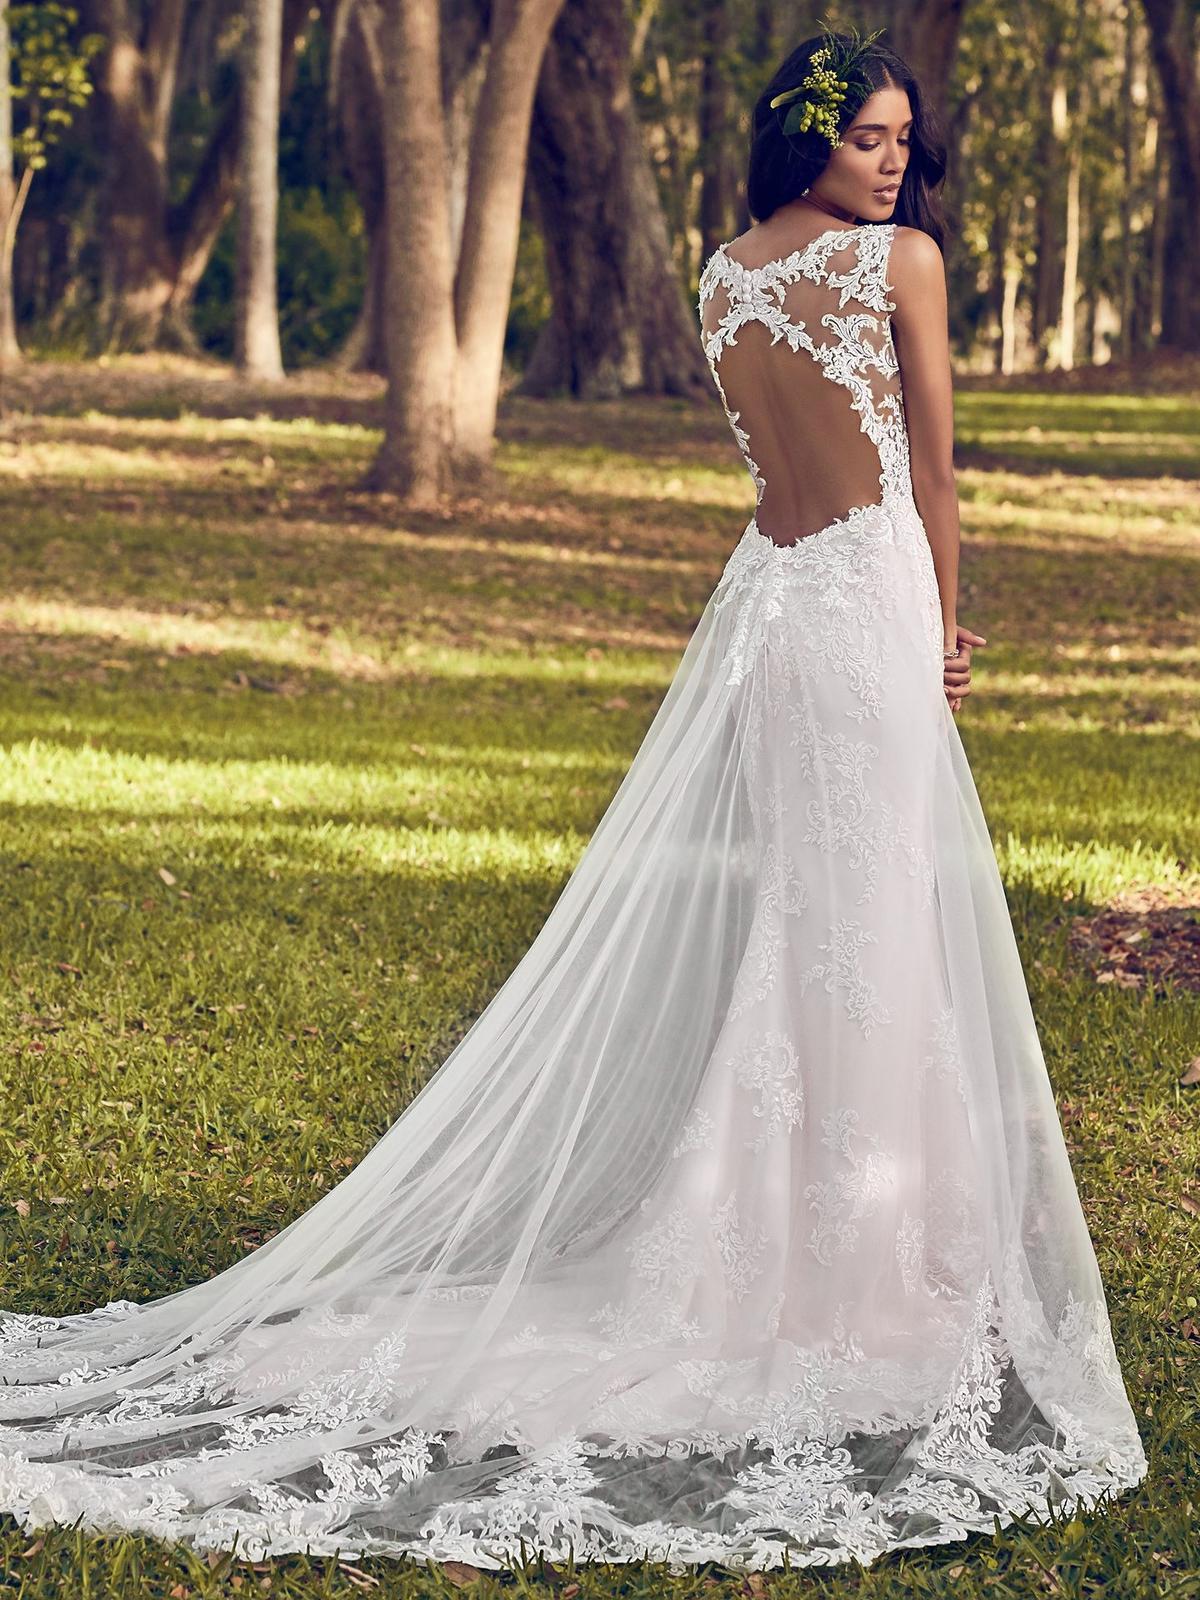 Nové svadobné šaty ♥ BERNADINE ♥ v Nitre - BERNADINE (nová kolekcia)